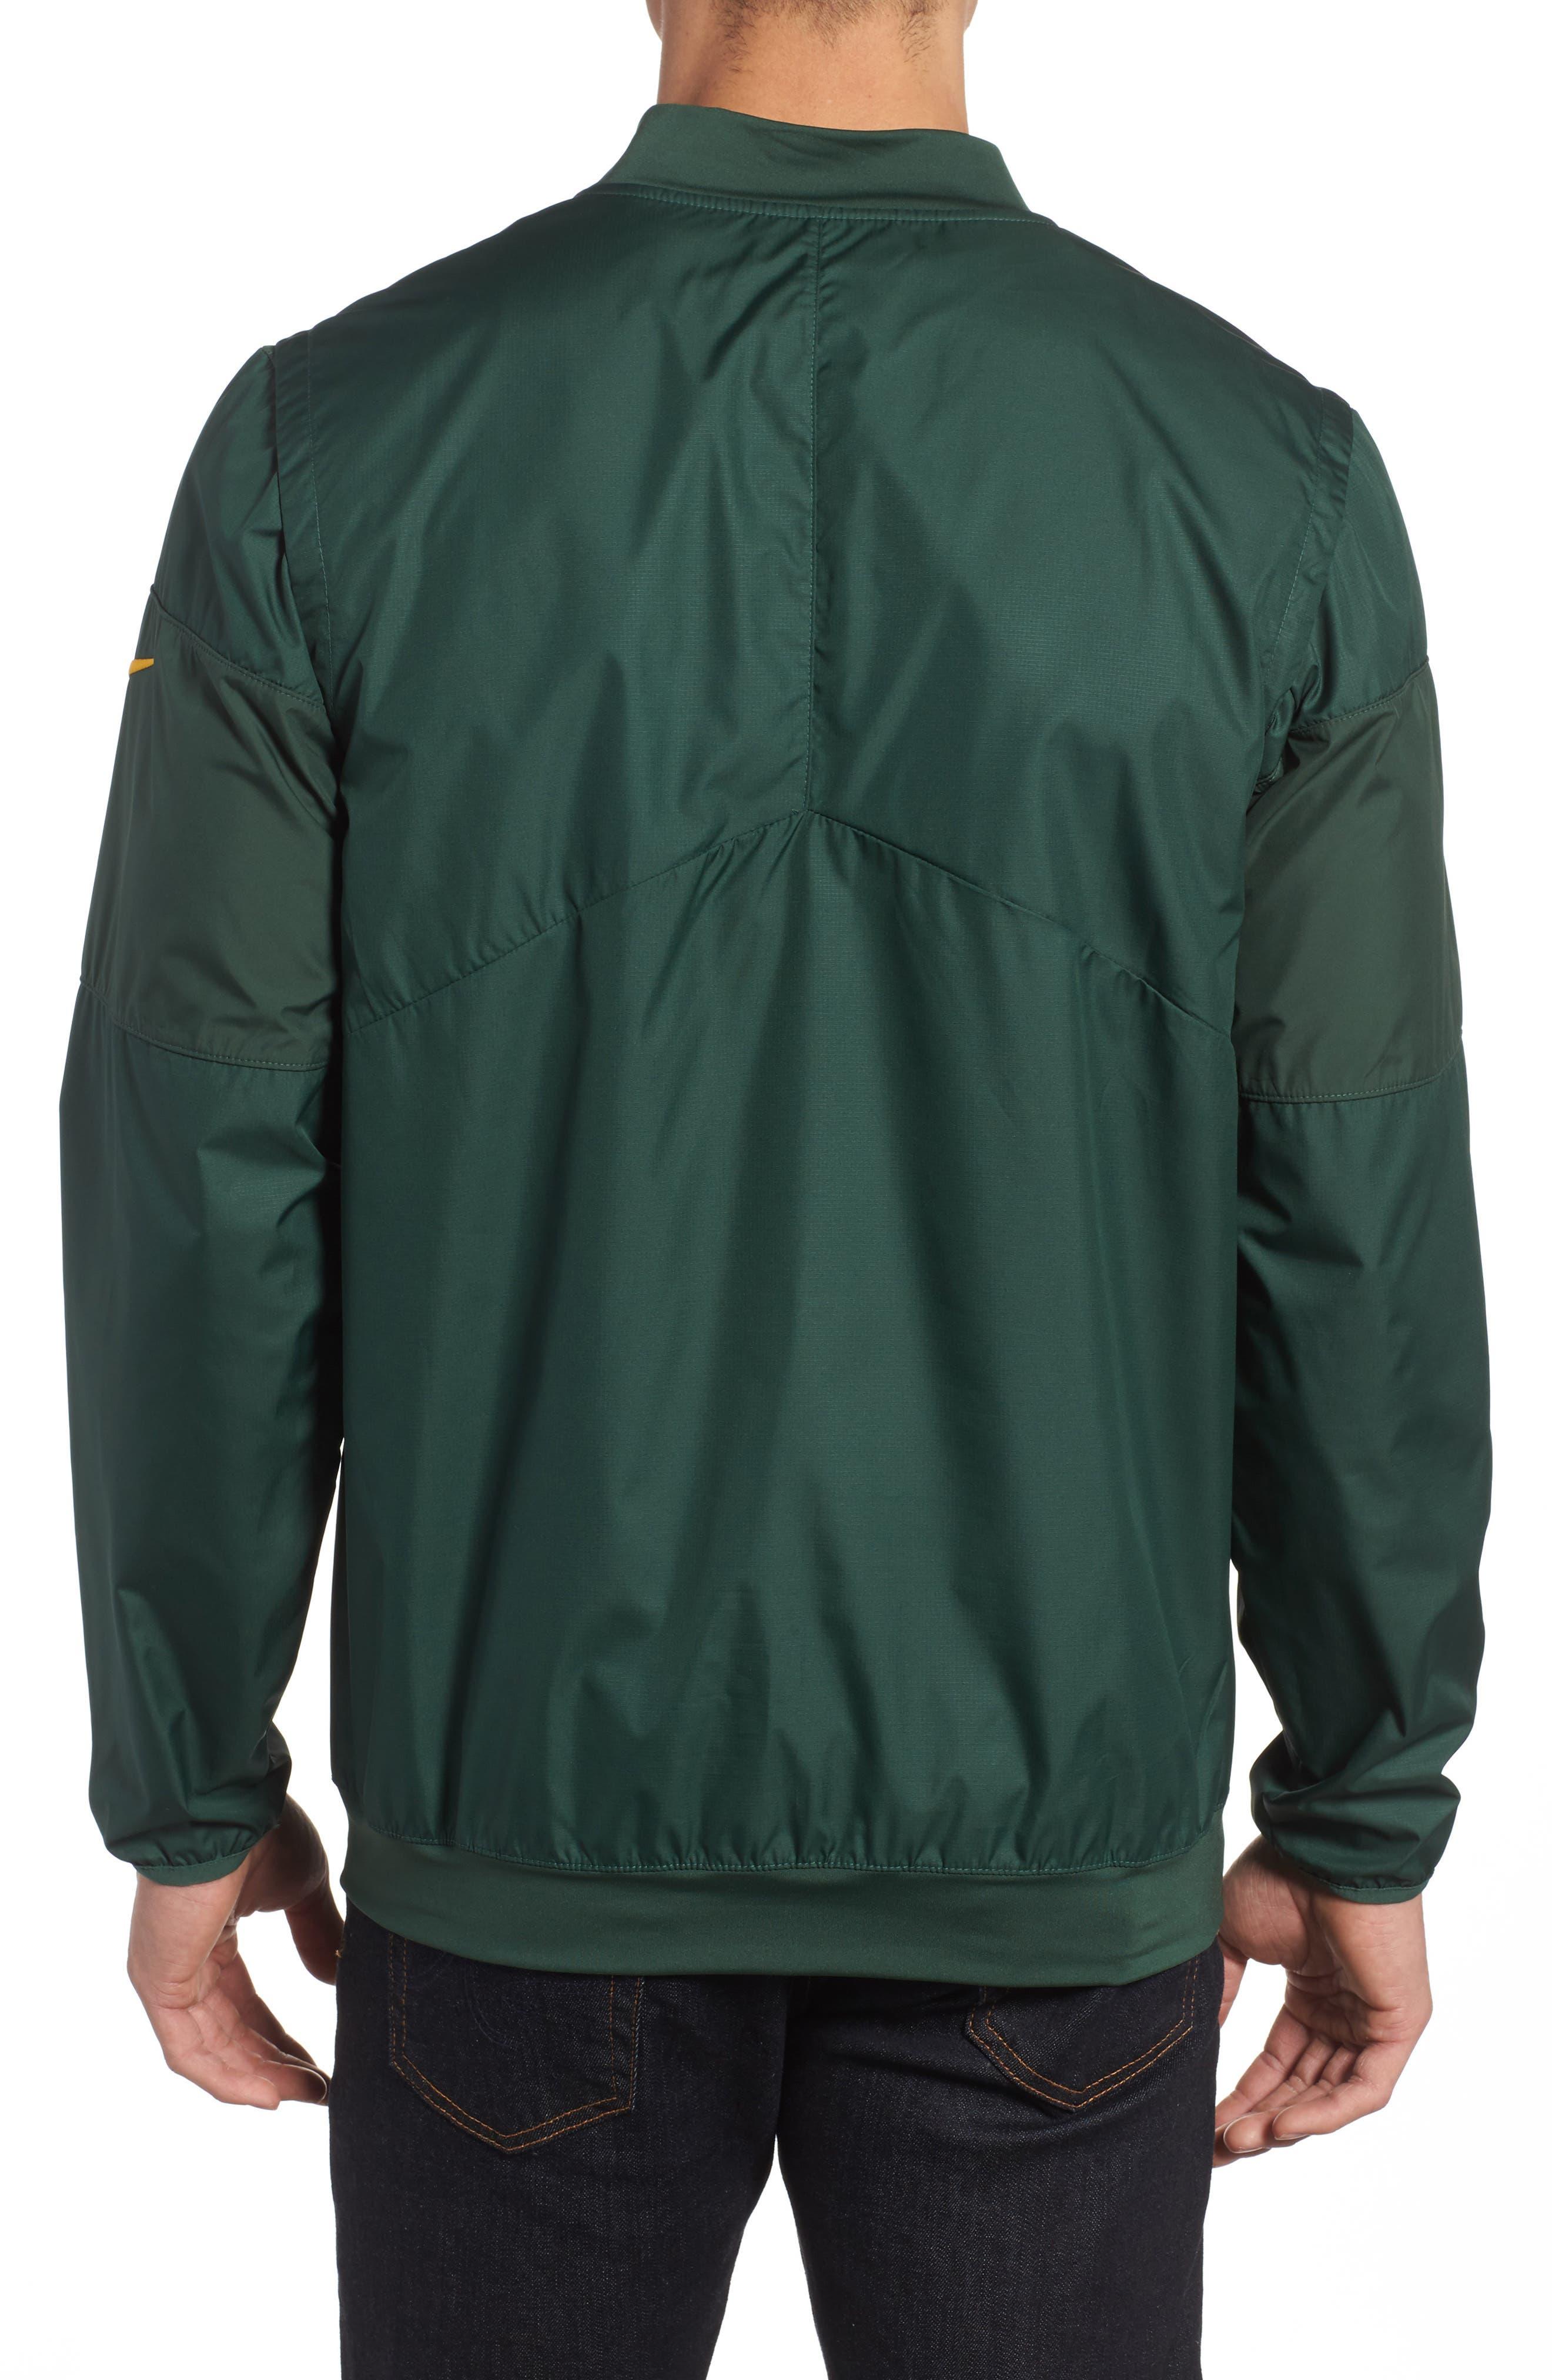 Lockdown NFL Pullover Jacket,                             Alternate thumbnail 8, color,